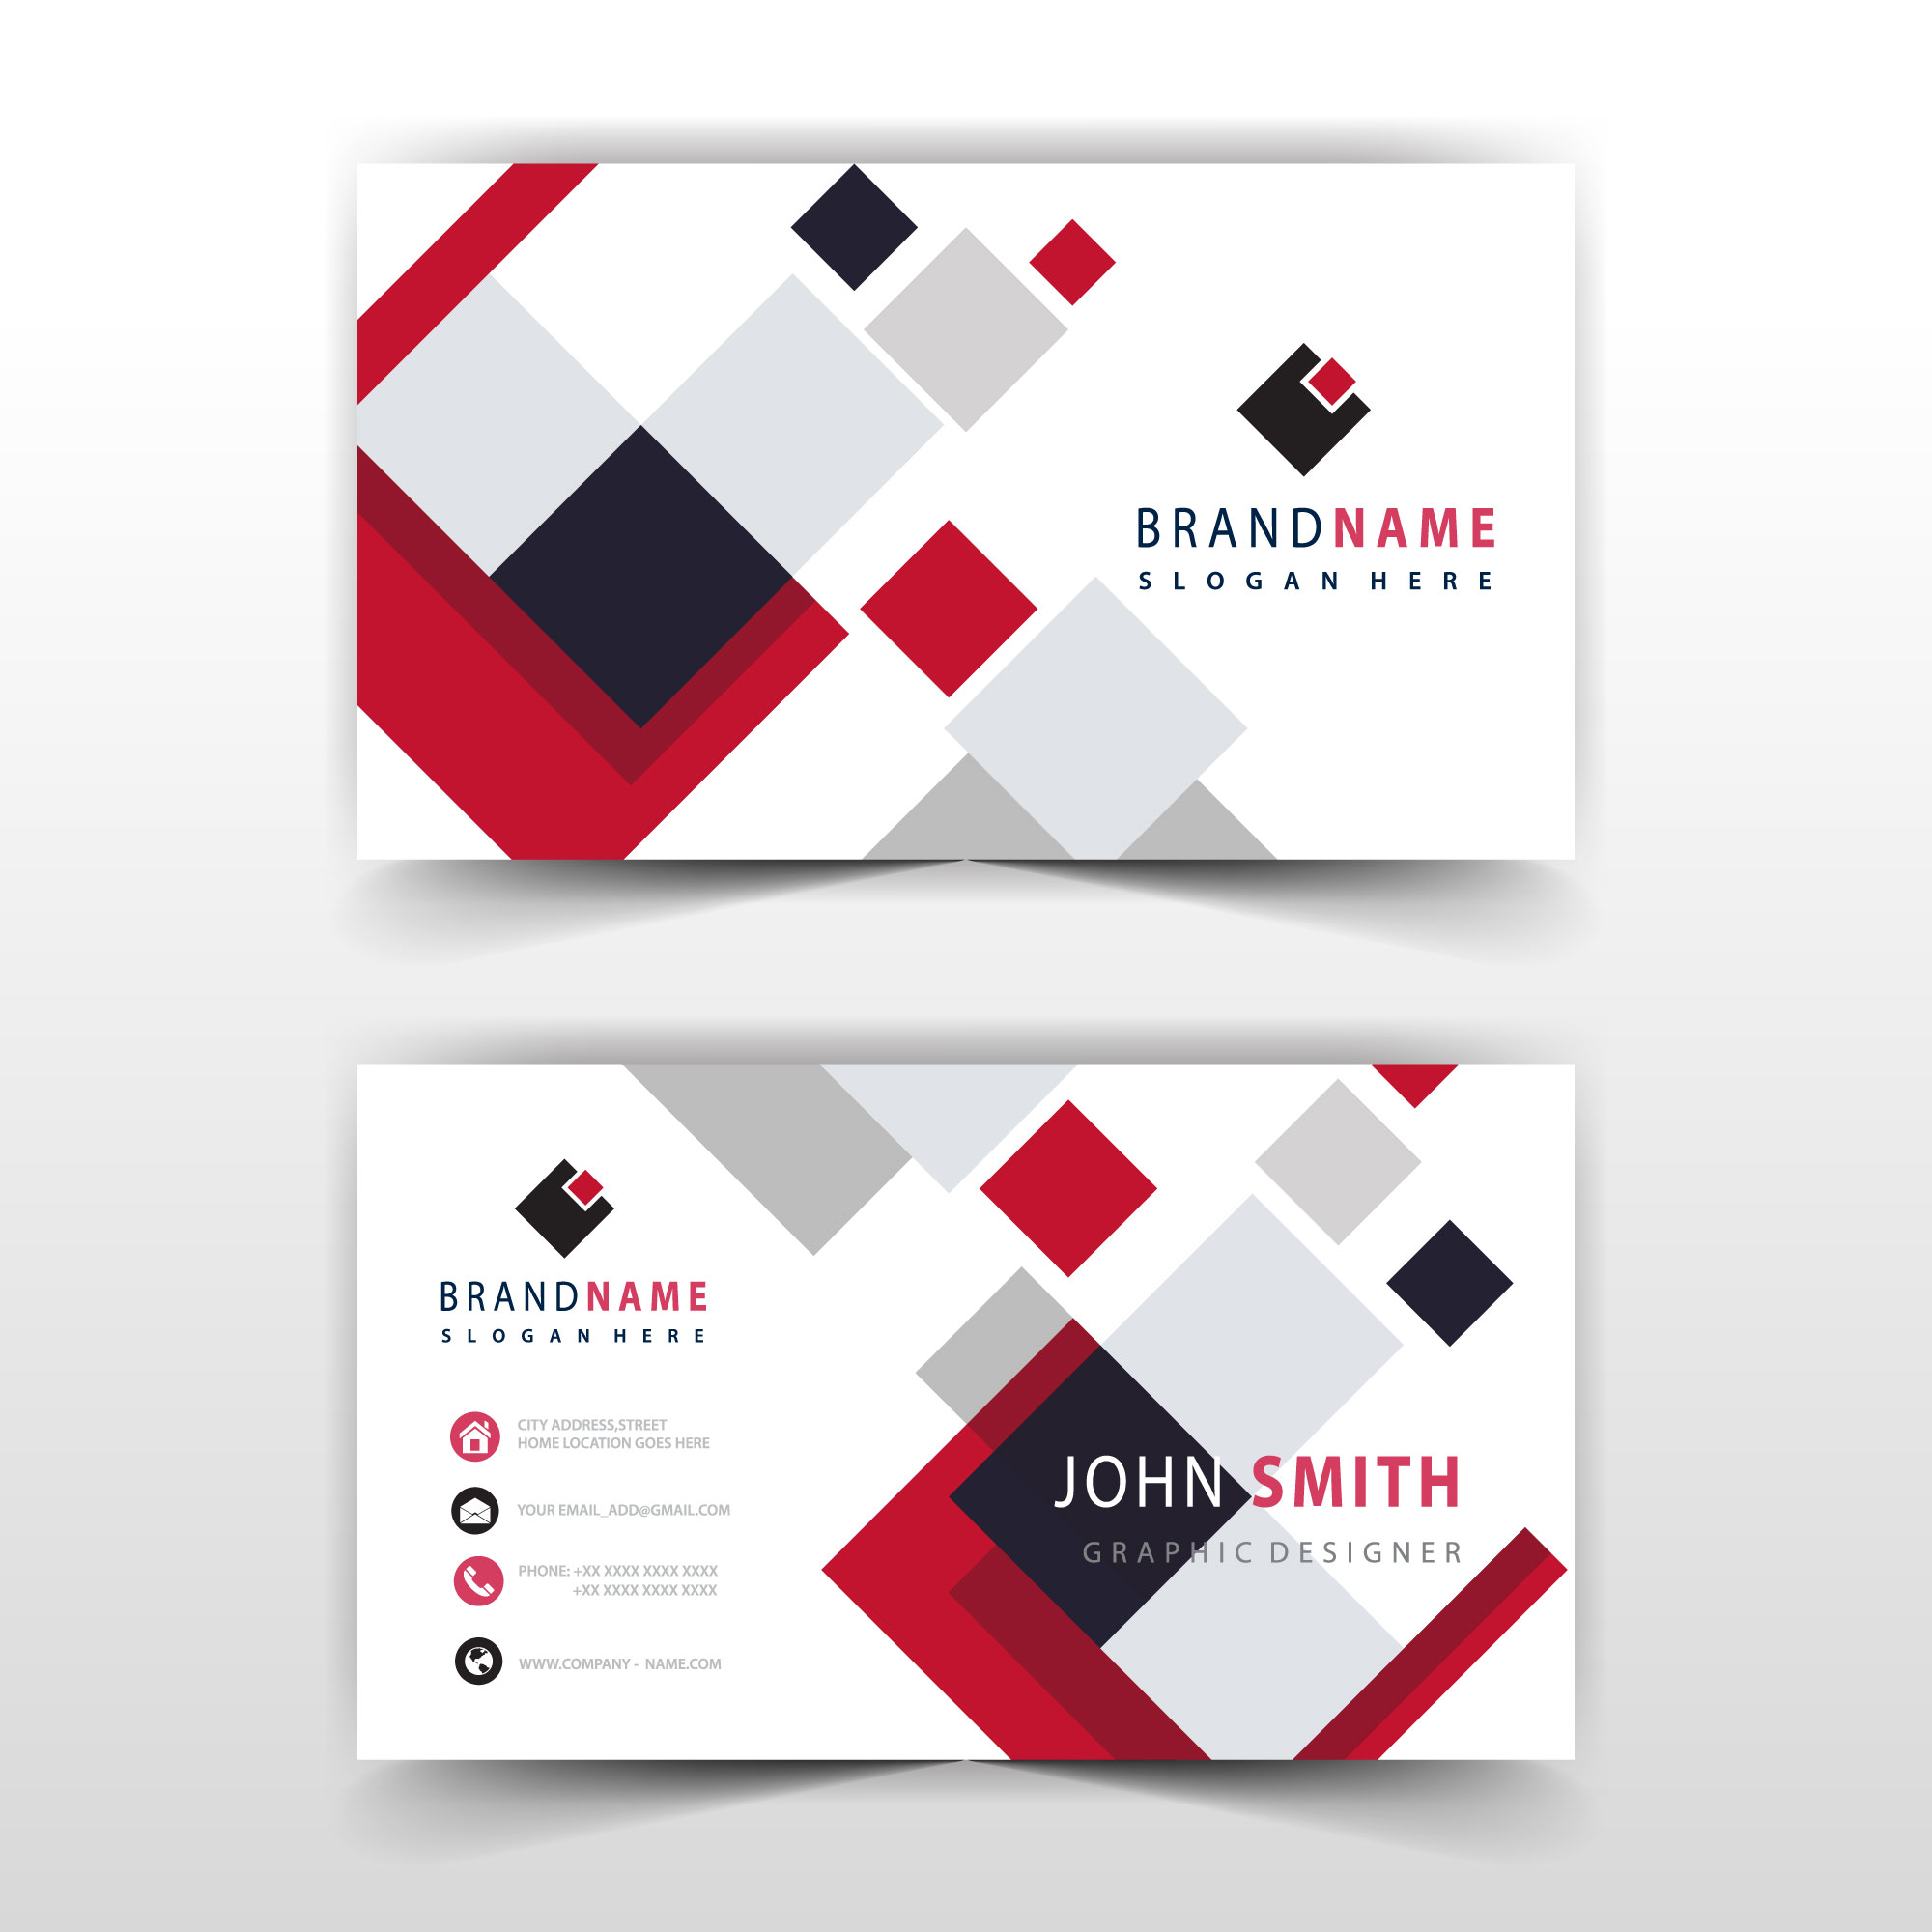 editable business card template 22 Vector Art at Vecteezy Inside Free Complimentary Card Templates